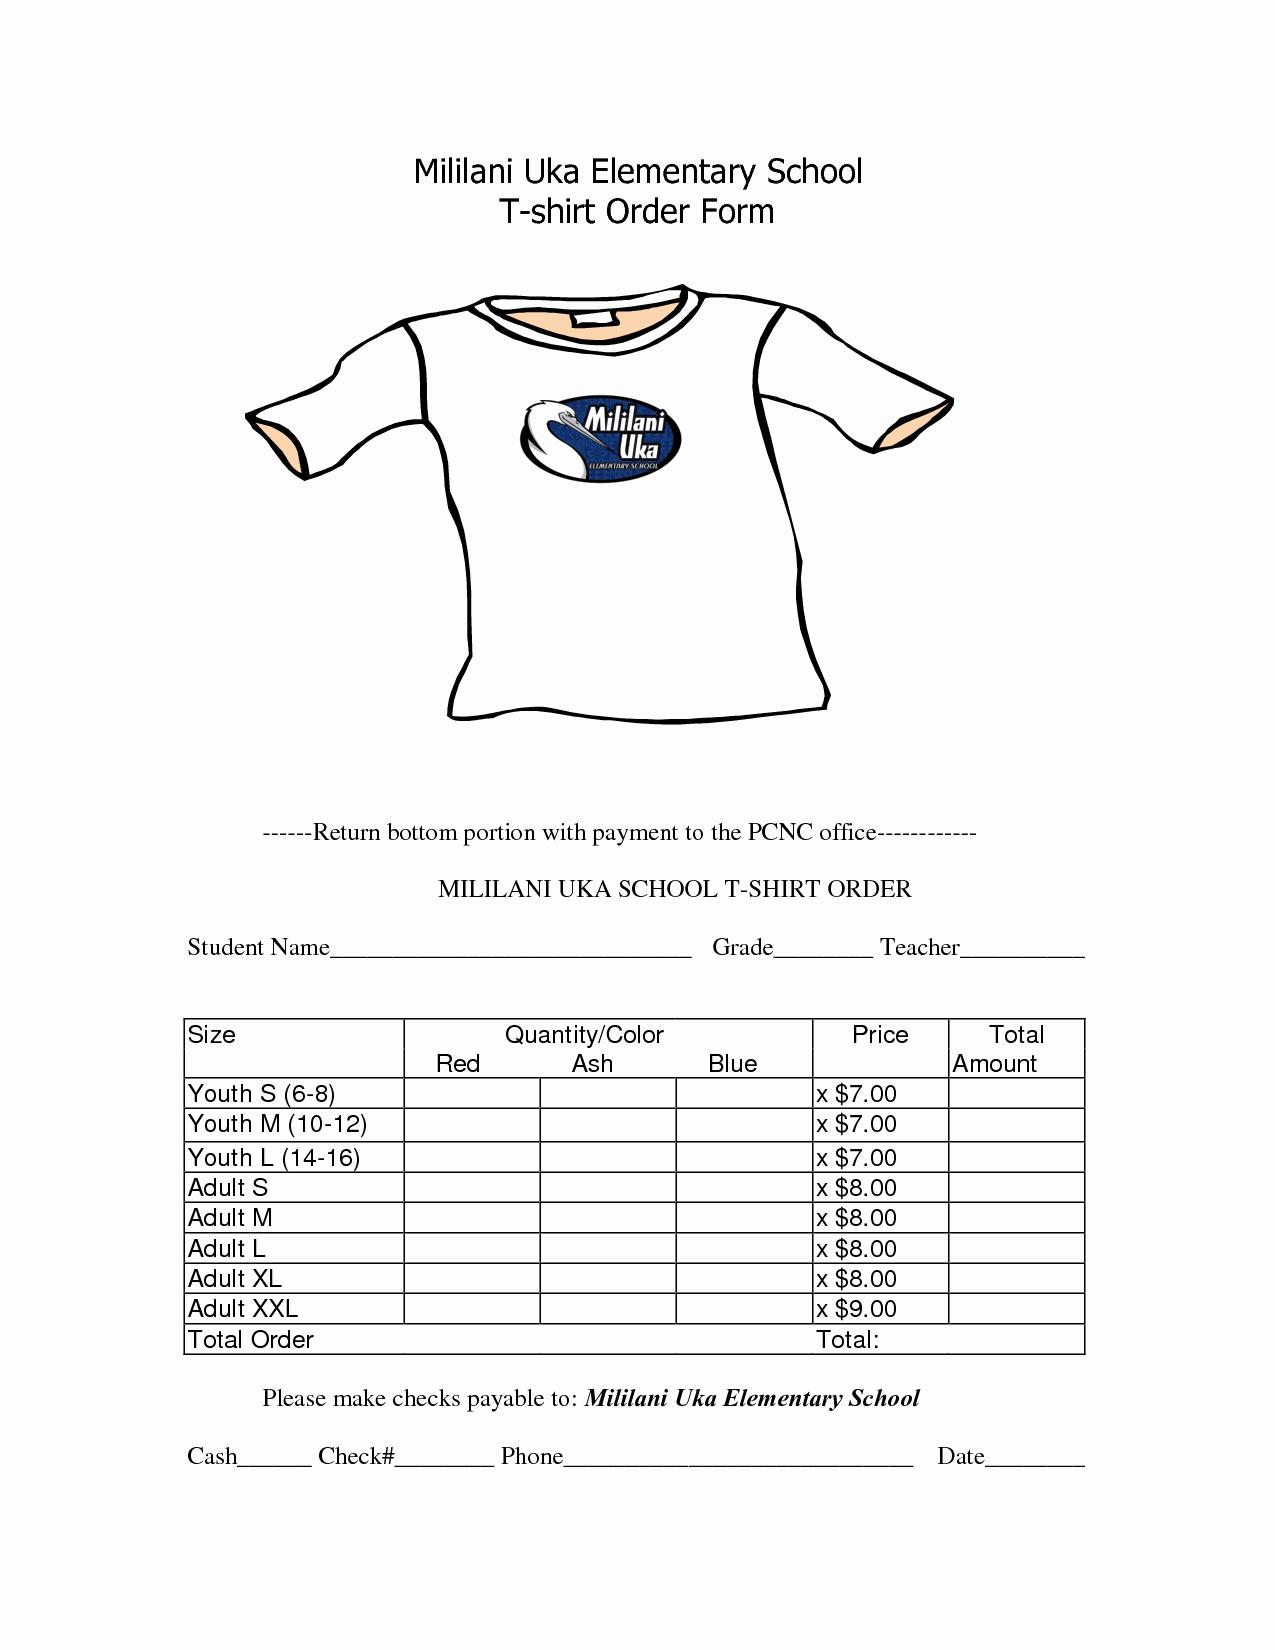 Shirt order form Template Elegant School T Shirt order form Template Clothes